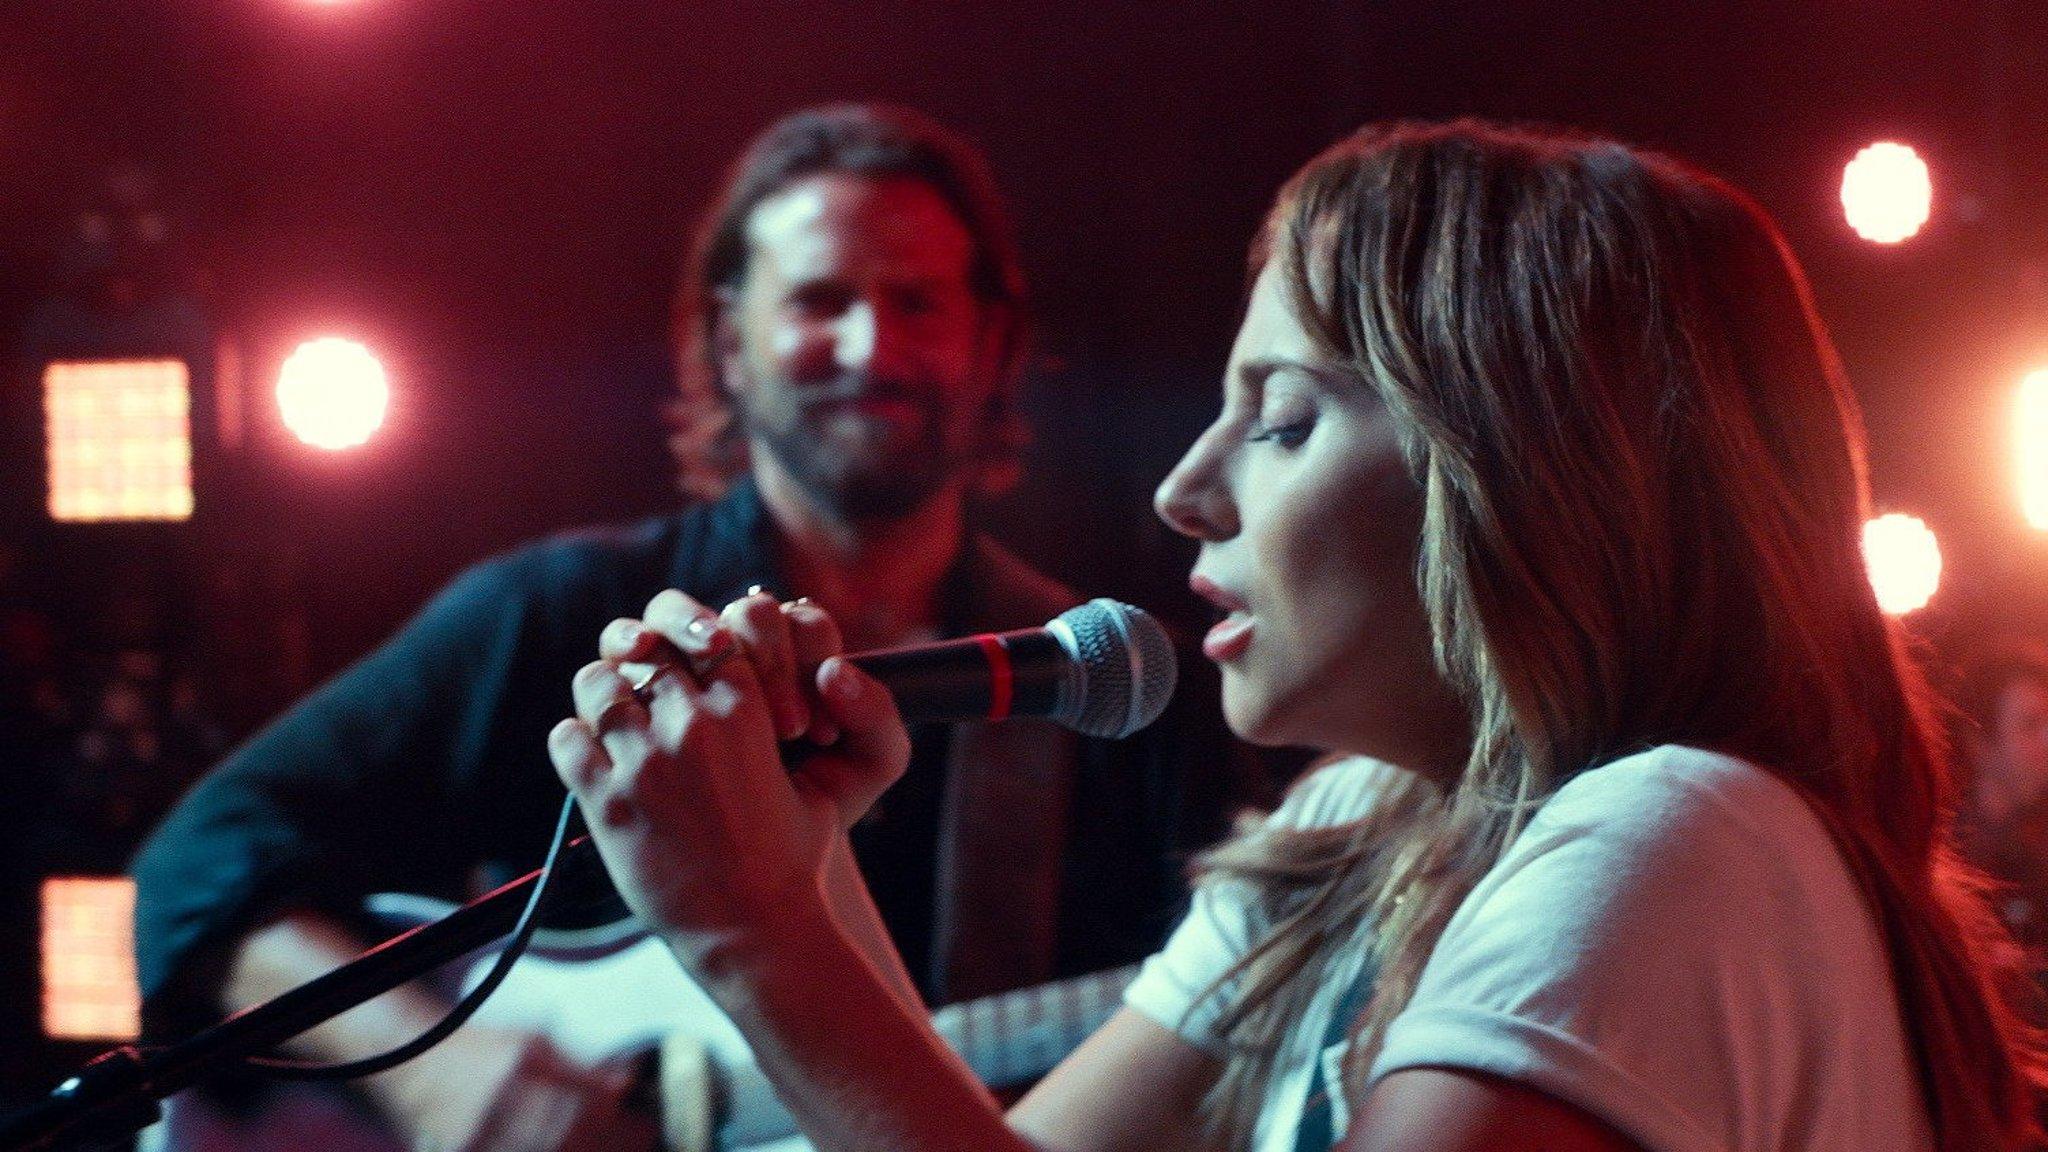 A Star Is Born — Bradley Cooper and Lady Gaga in a born-again classic